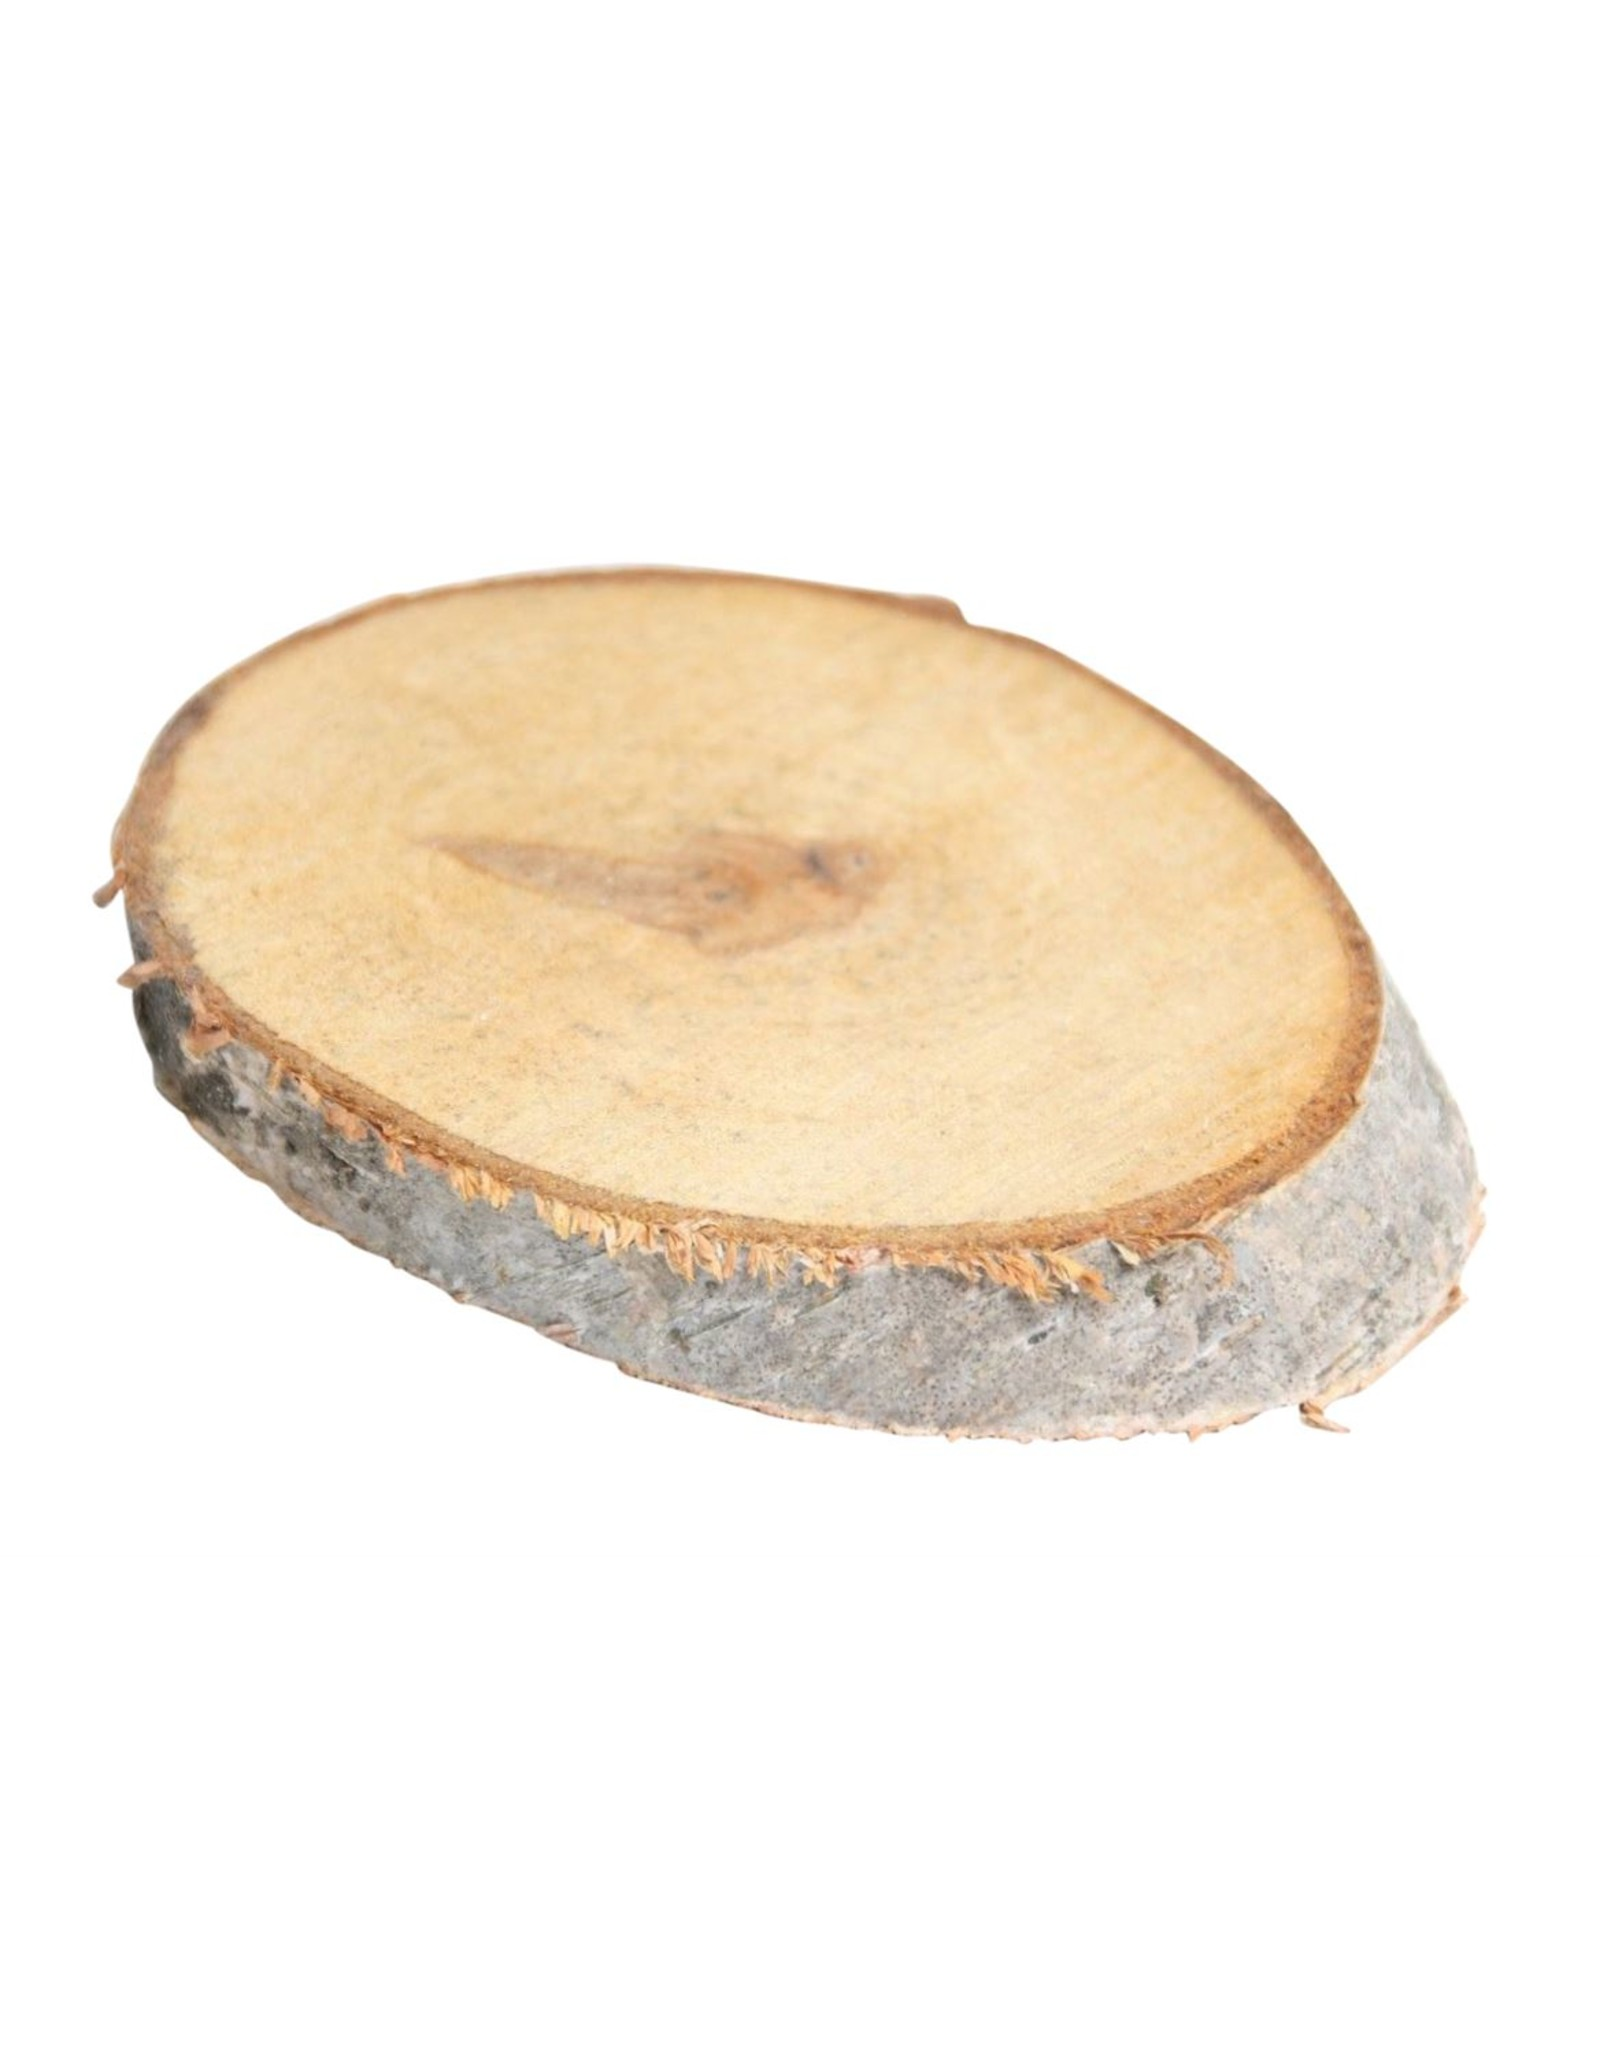 HD Basic Birch Slice Oval L 16-19x23-25  ↑2 (x 40)